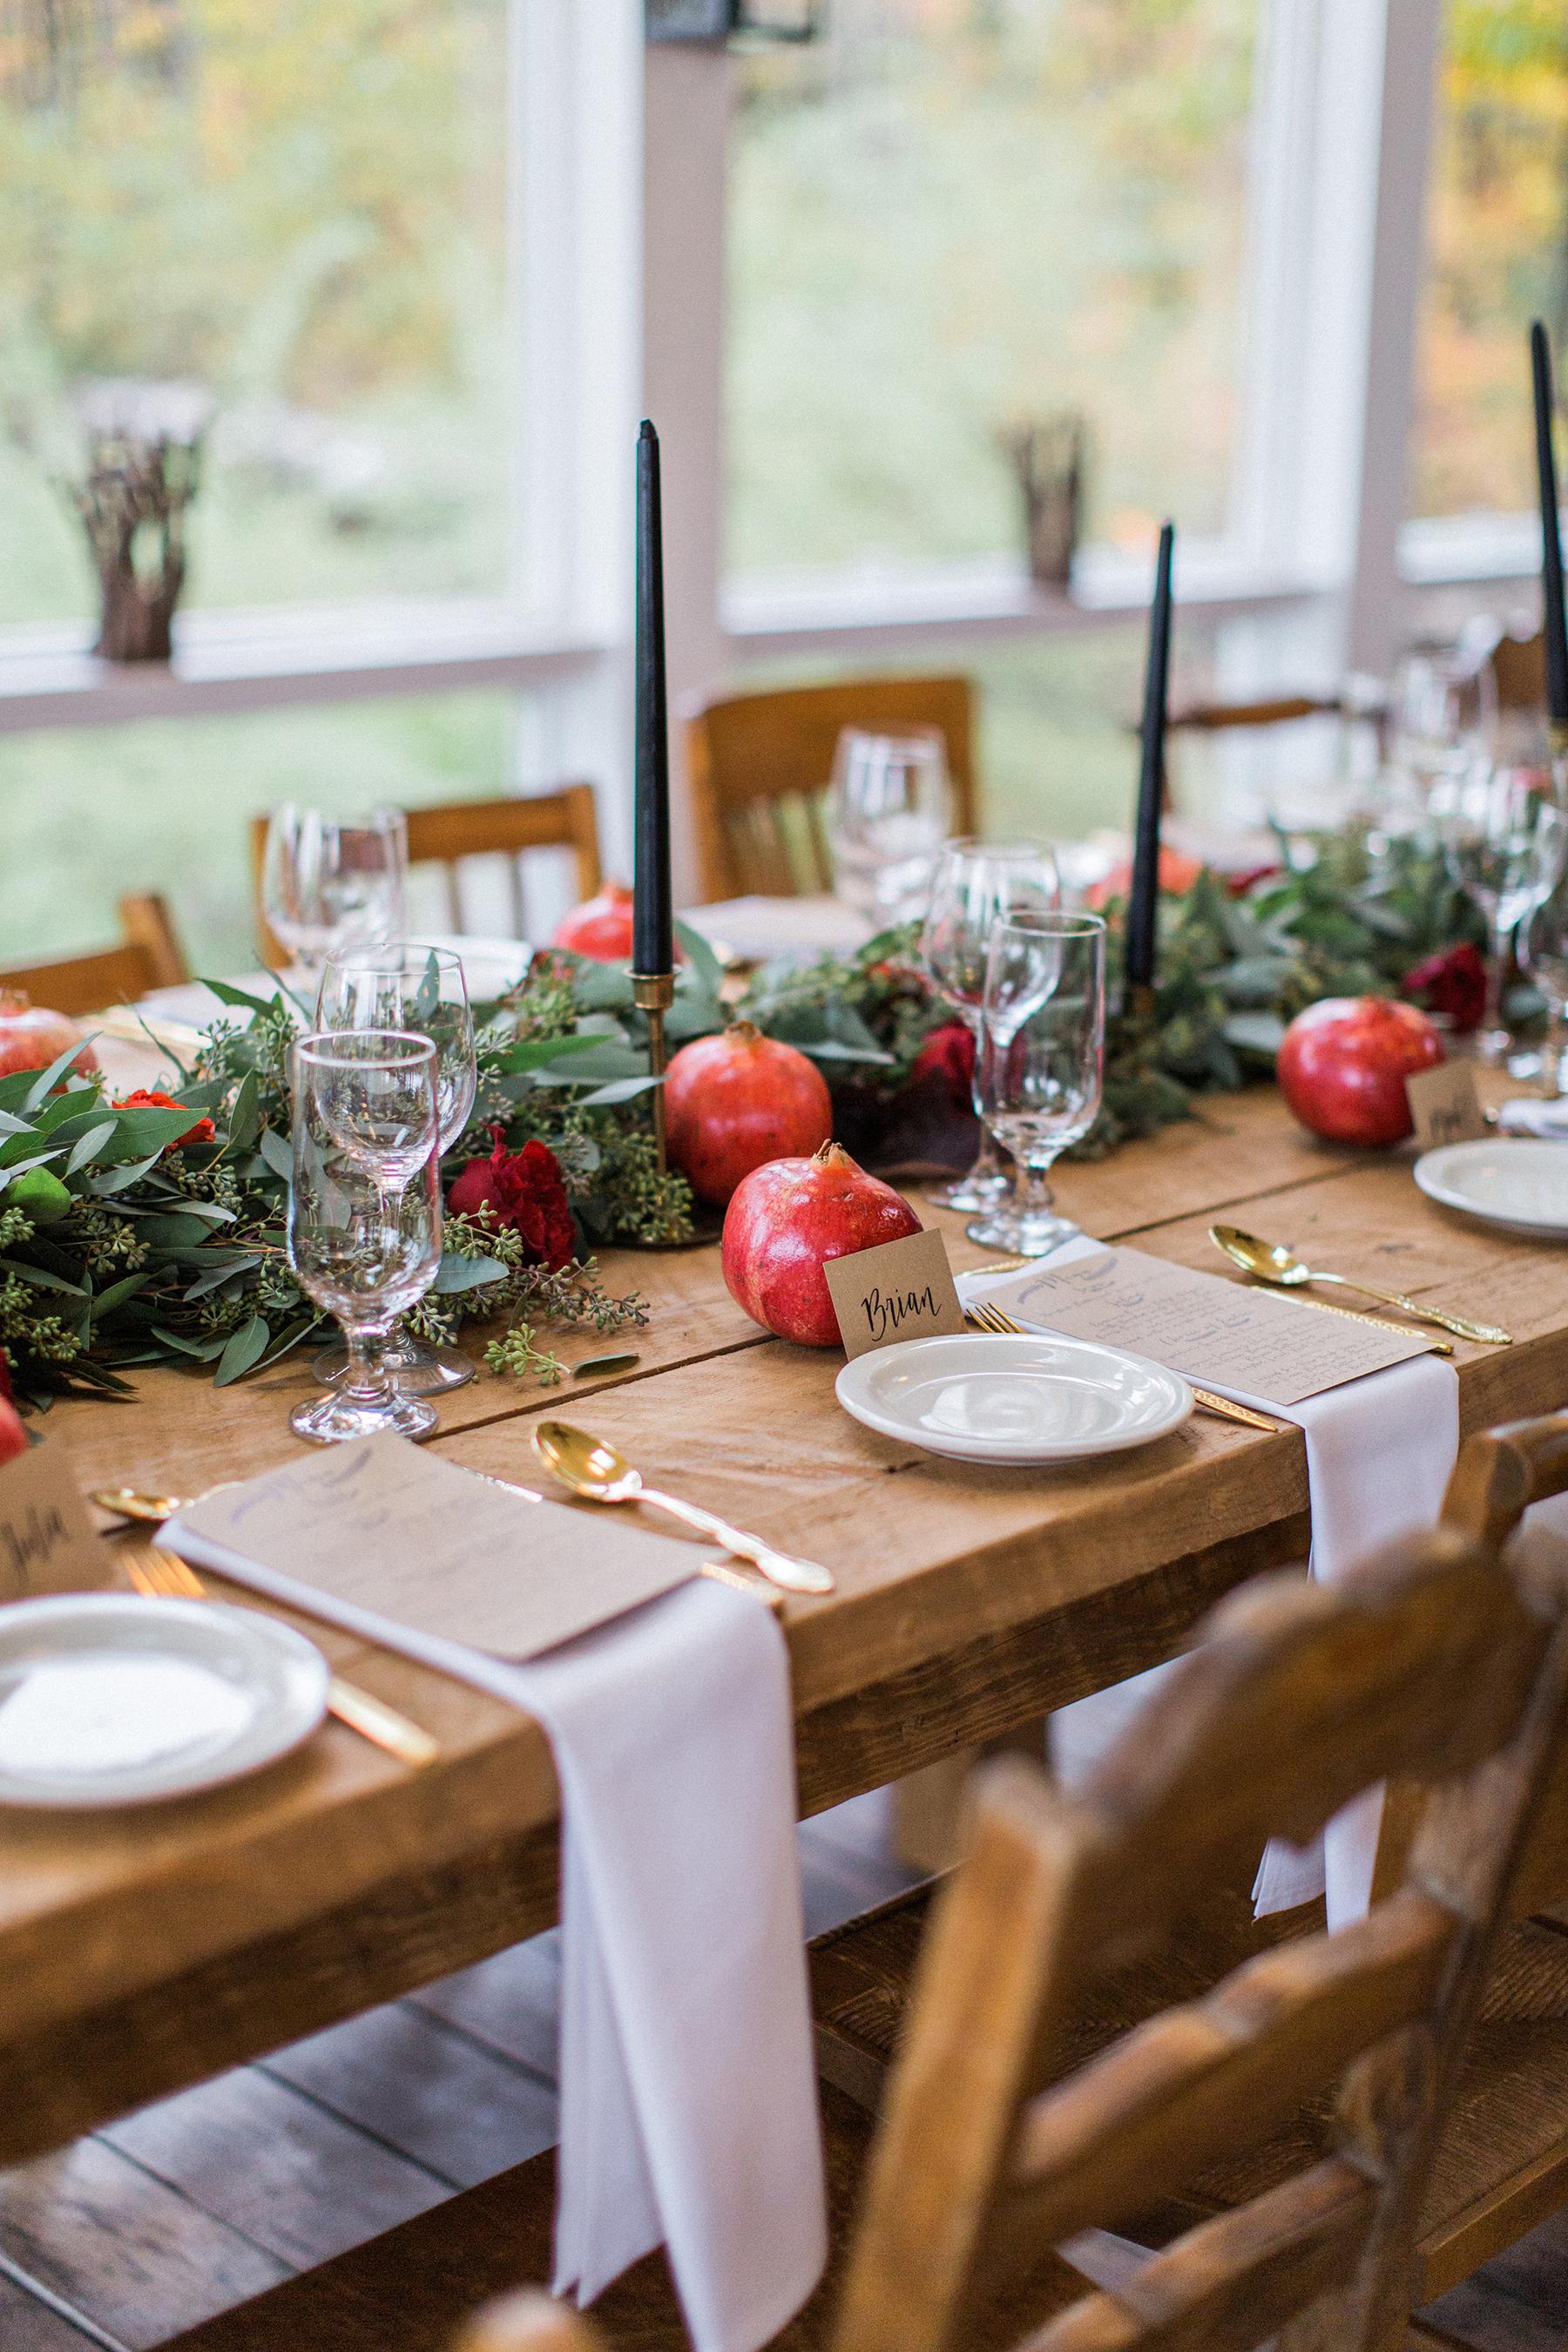 7 Décor Ideas for Your Thanksgiving Wedding